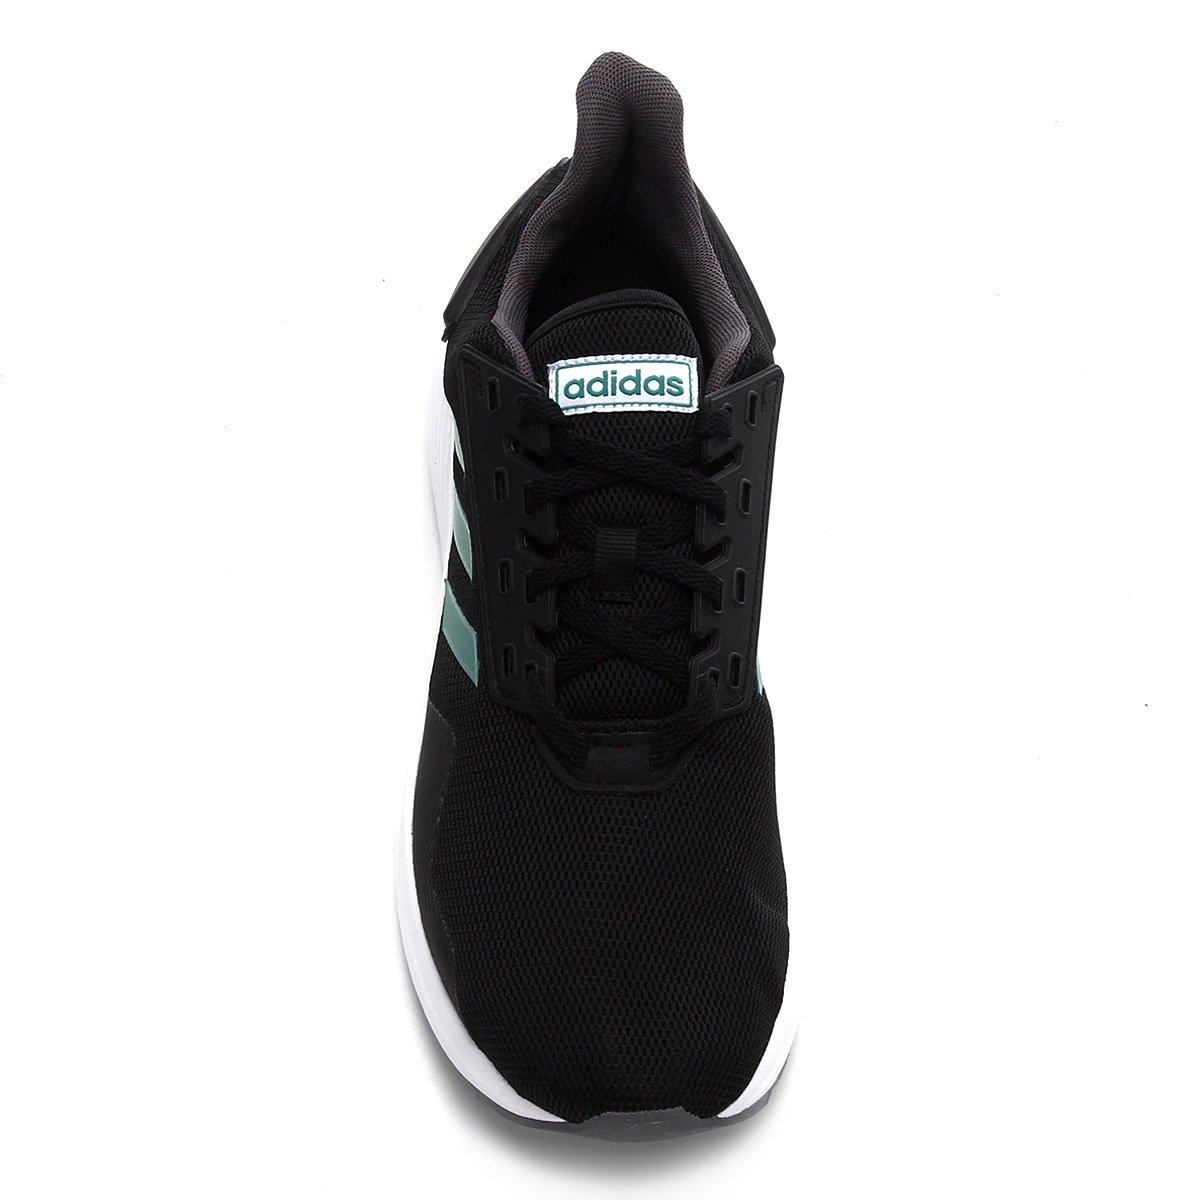 Tênis Adidas Duramo 9 Masculino - Tam: 44 - 2